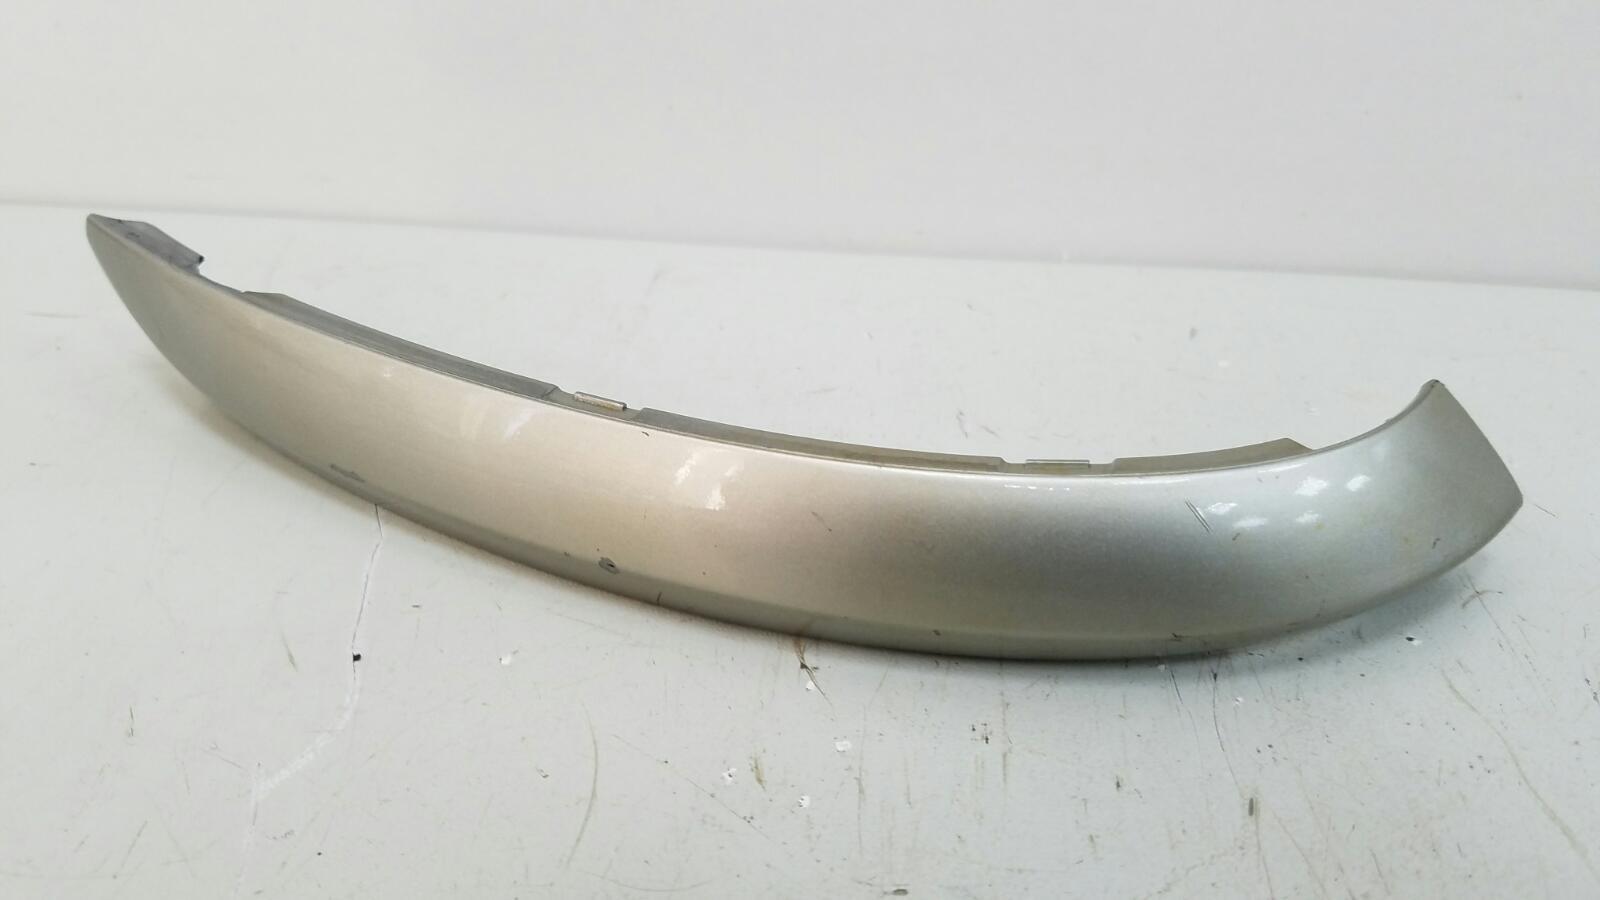 Накладка ручки двери внутренней Bmw X5 E53 M62 1999 левая